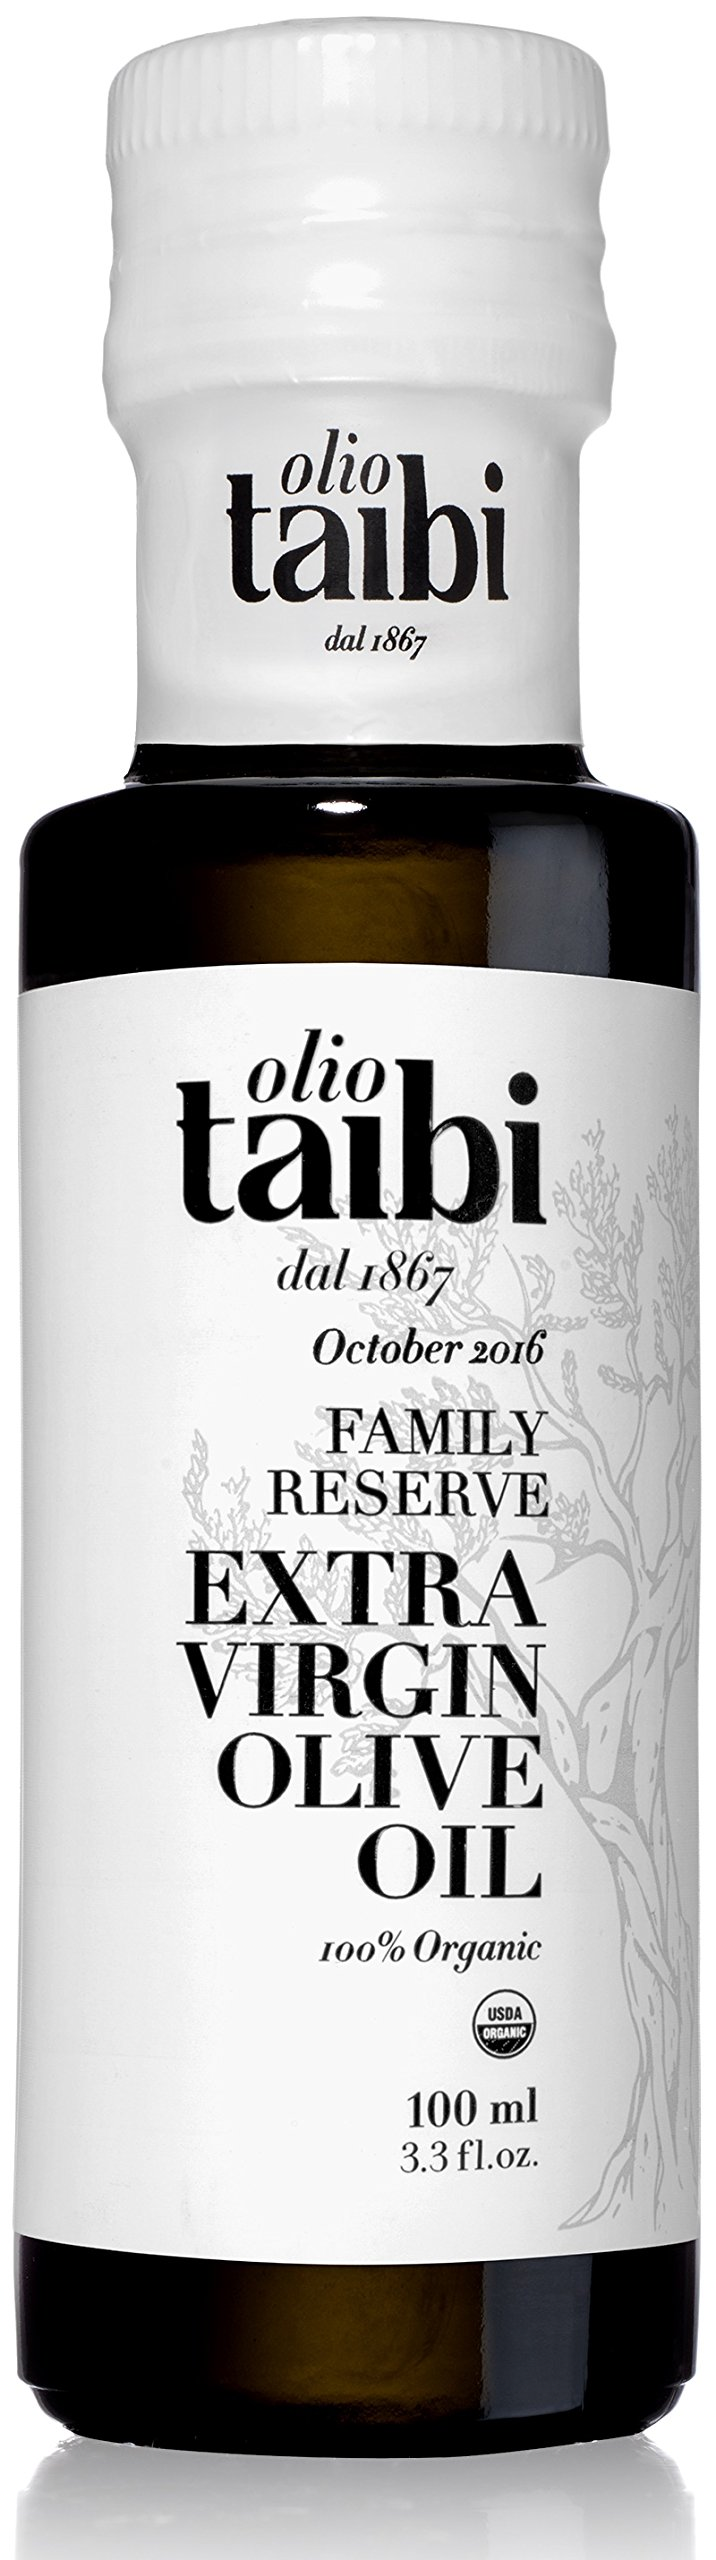 "NEW HARVEST OCTOBER 2017 Award-Winning Organic Extra Virgin Olive Oil, Monocultivar ""Biancolilla"", Single Sourced Sicily, Italy, Fruity, High Polyphenols, Unrefined, 3.38 Fl Oz - Olio Taibi"